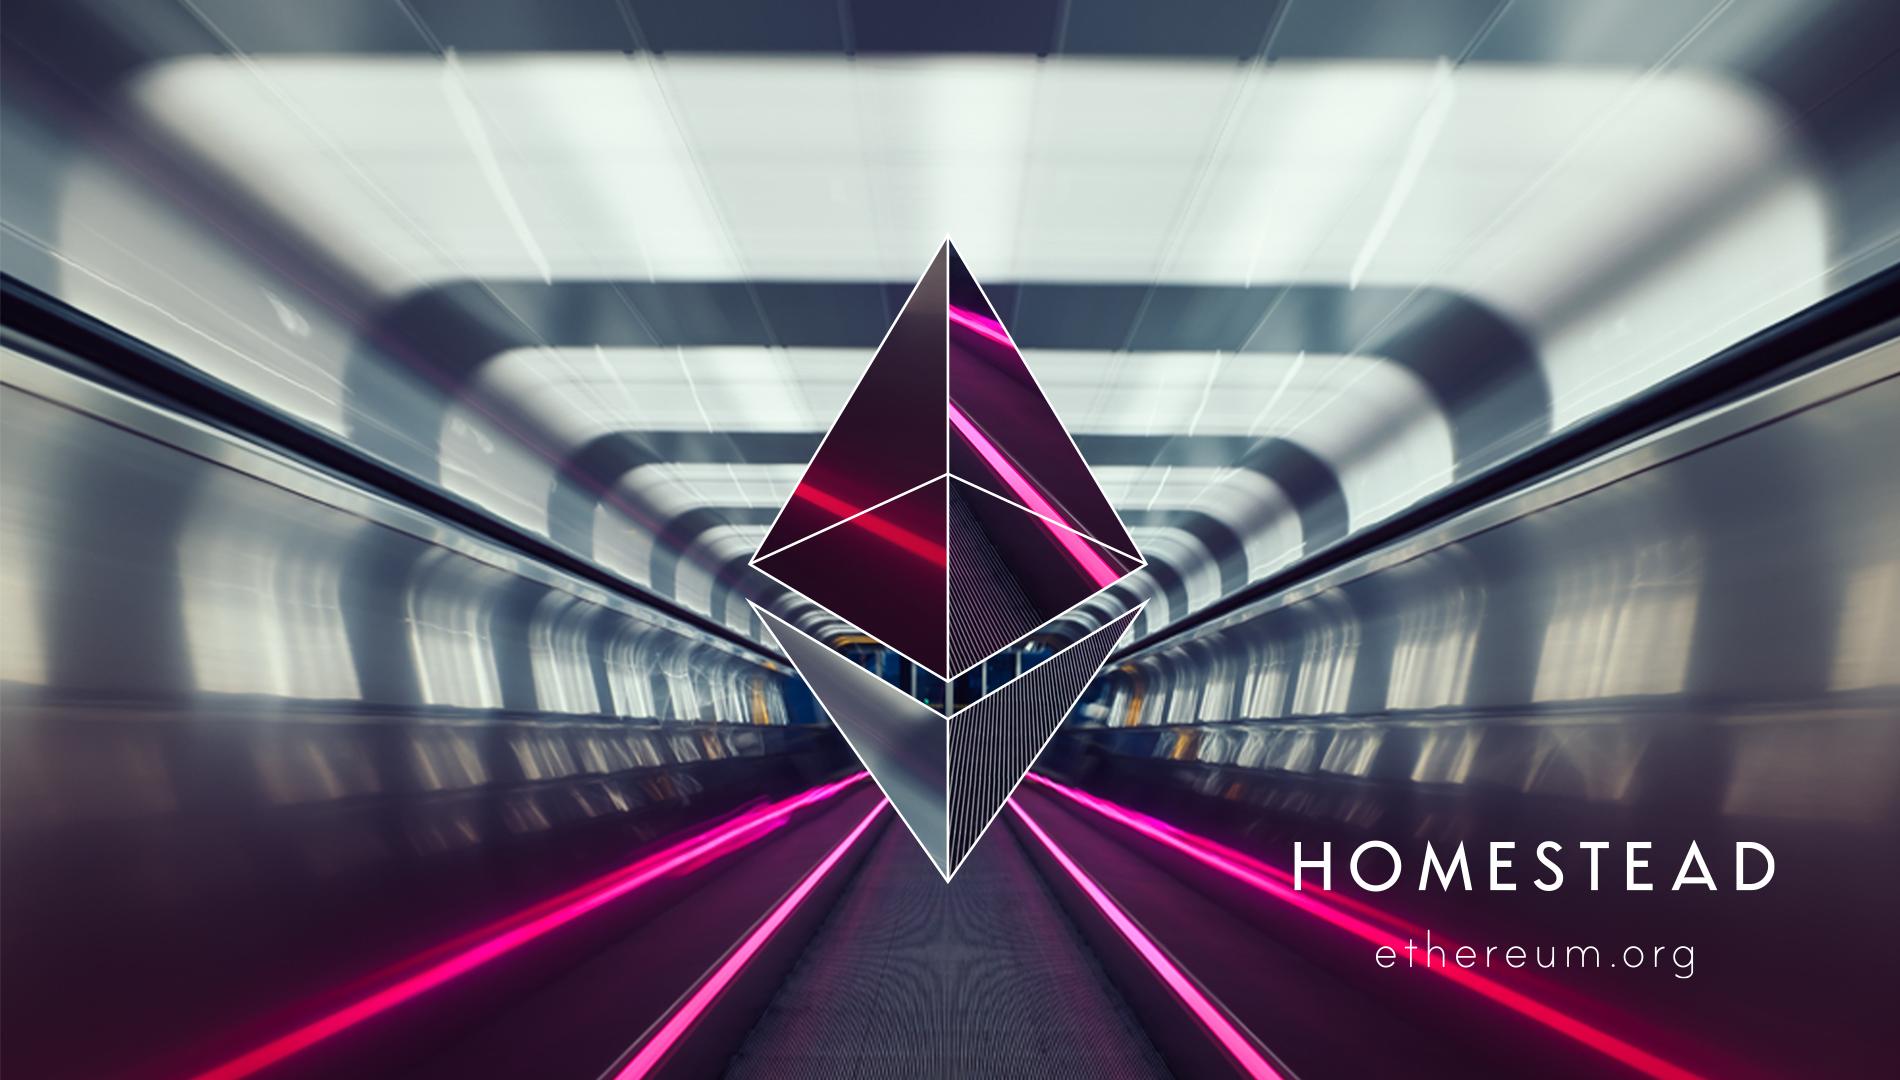 Ethereum logo against a futuristic backdrop.